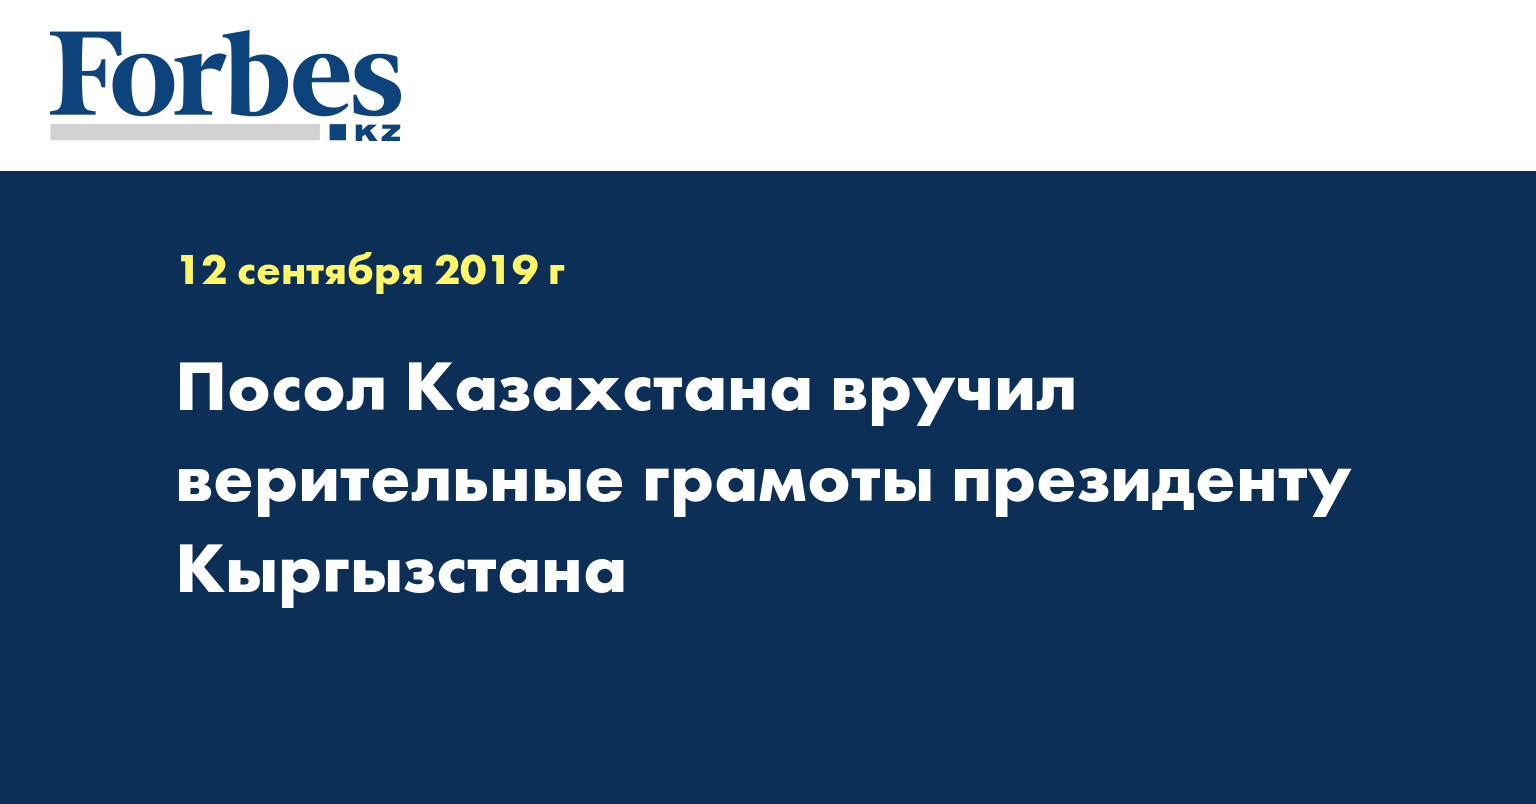 Посол Казахстана вручил верительные грамоты президенту Кыргызстана